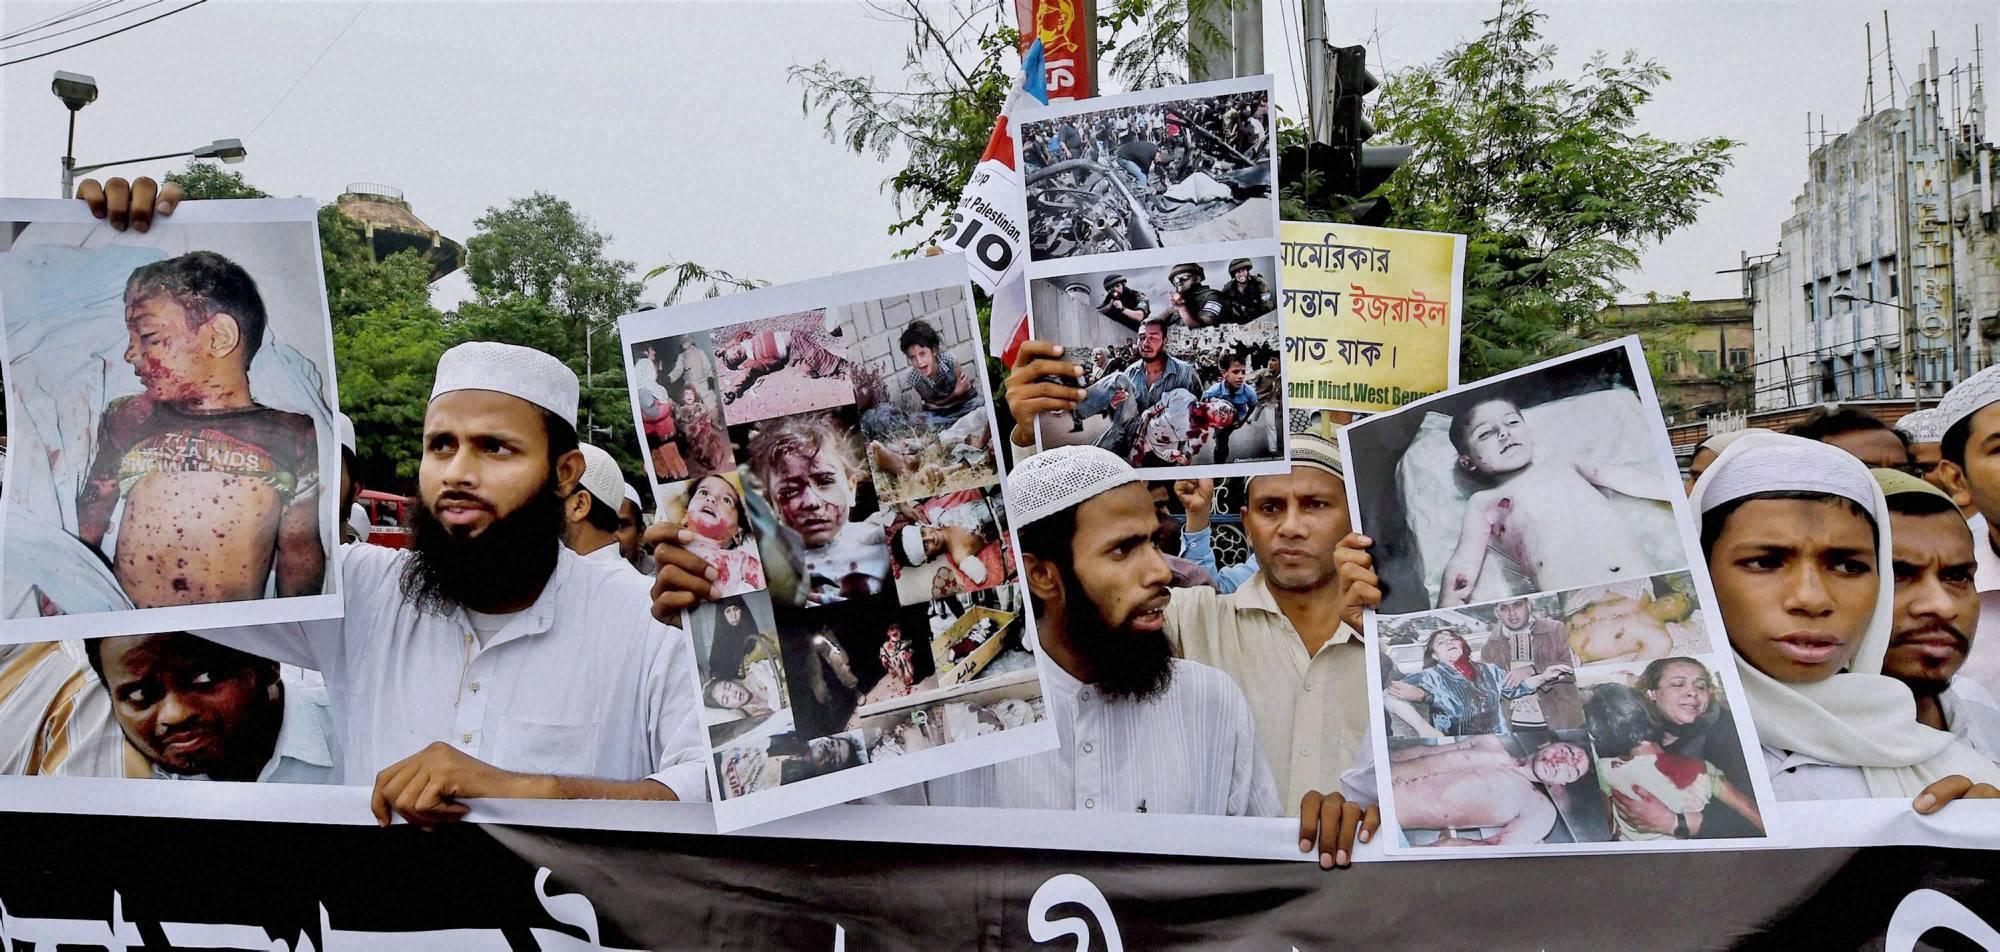 Muslims, display posters,protest, against Israel's, military, operation, Gaza, kolkata